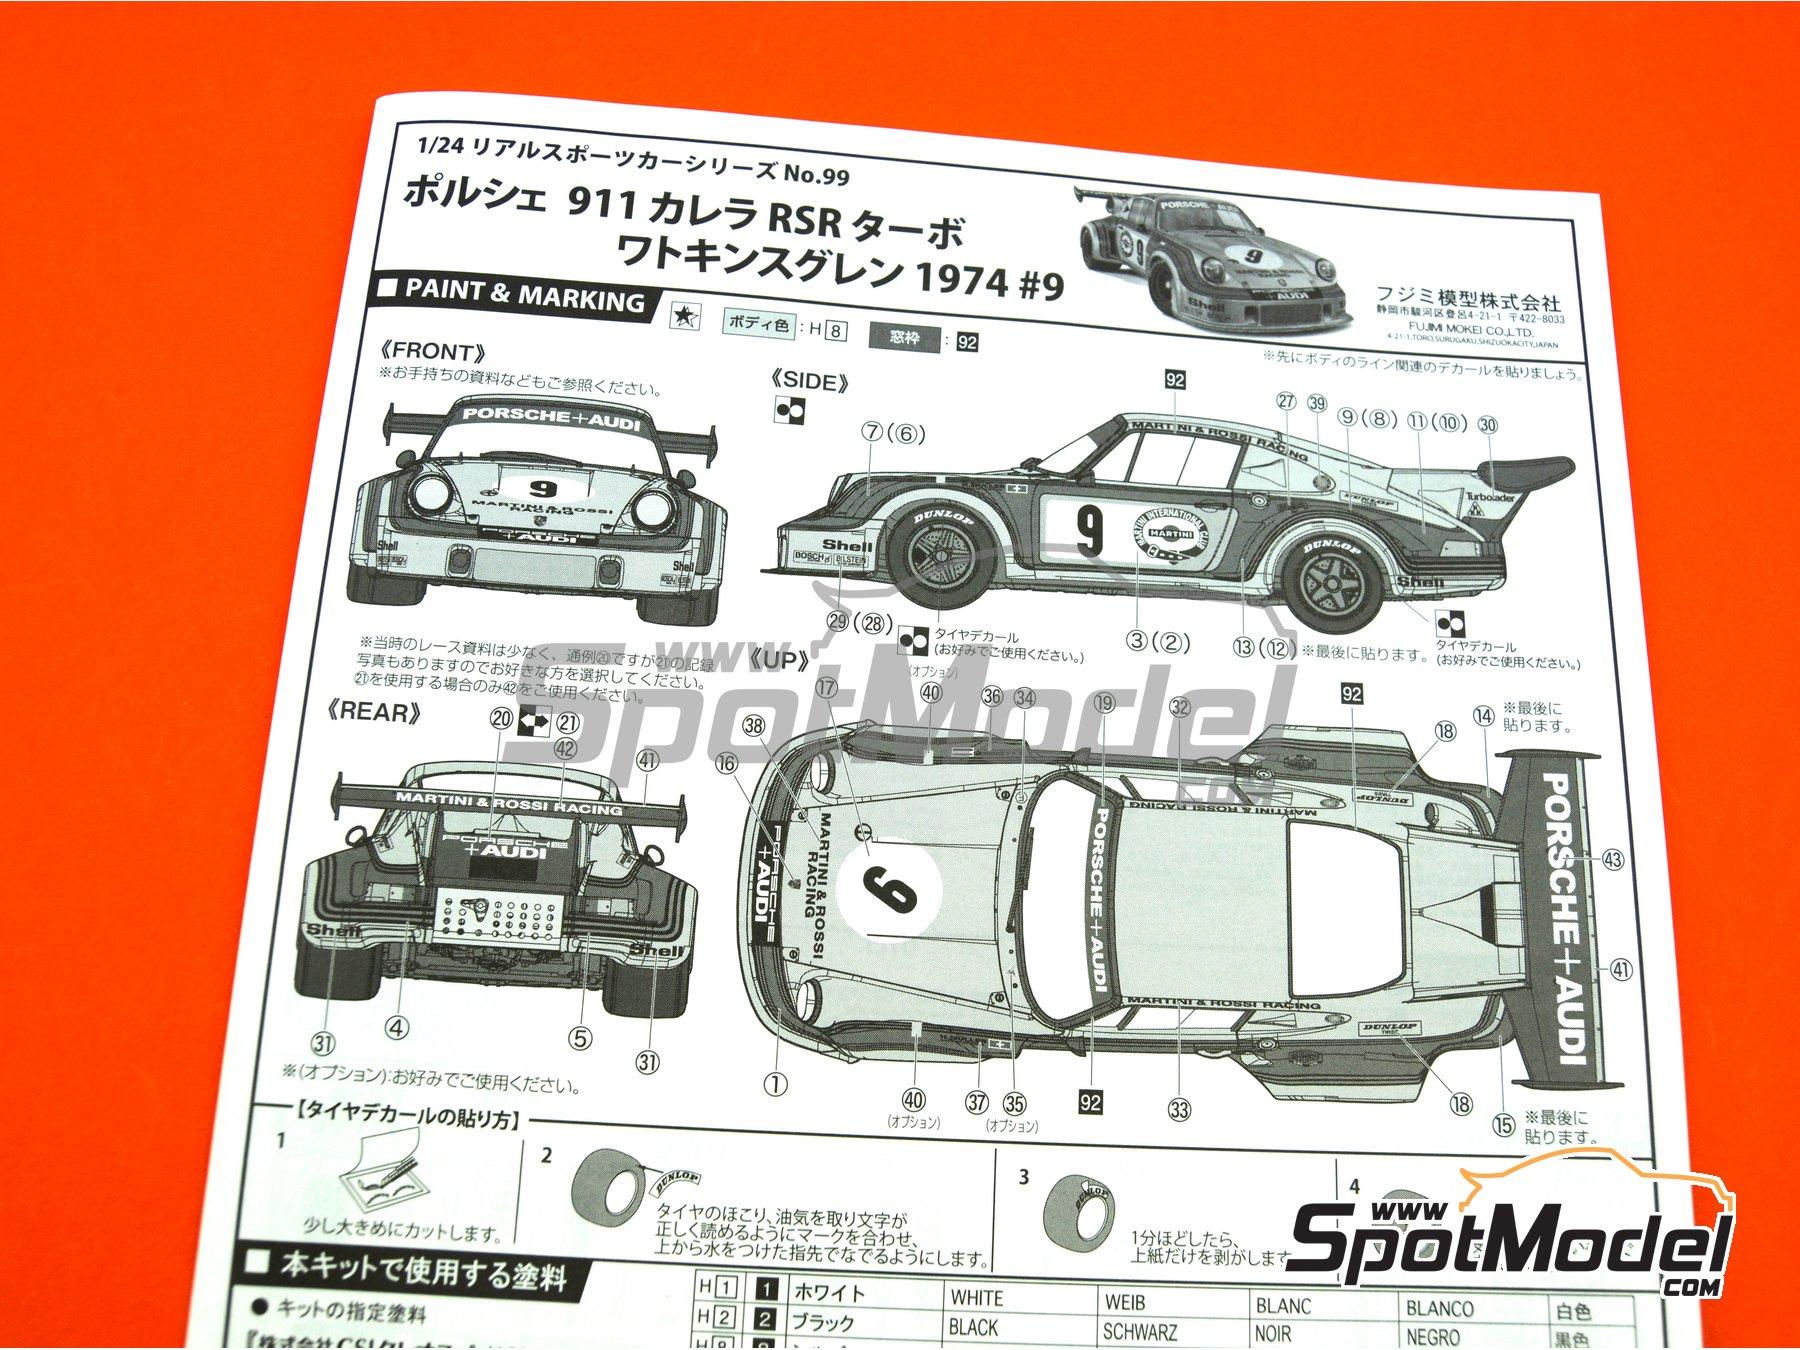 Image 14: Porsche 911 Carrera RSR Turbo Martini Rossi Porsche Audi - Watkins Glen 6 Hours 1974   Model car kit in 1/24 scale manufactured by Fujimi (ref.FJ126494, also 126494 and RS-99)